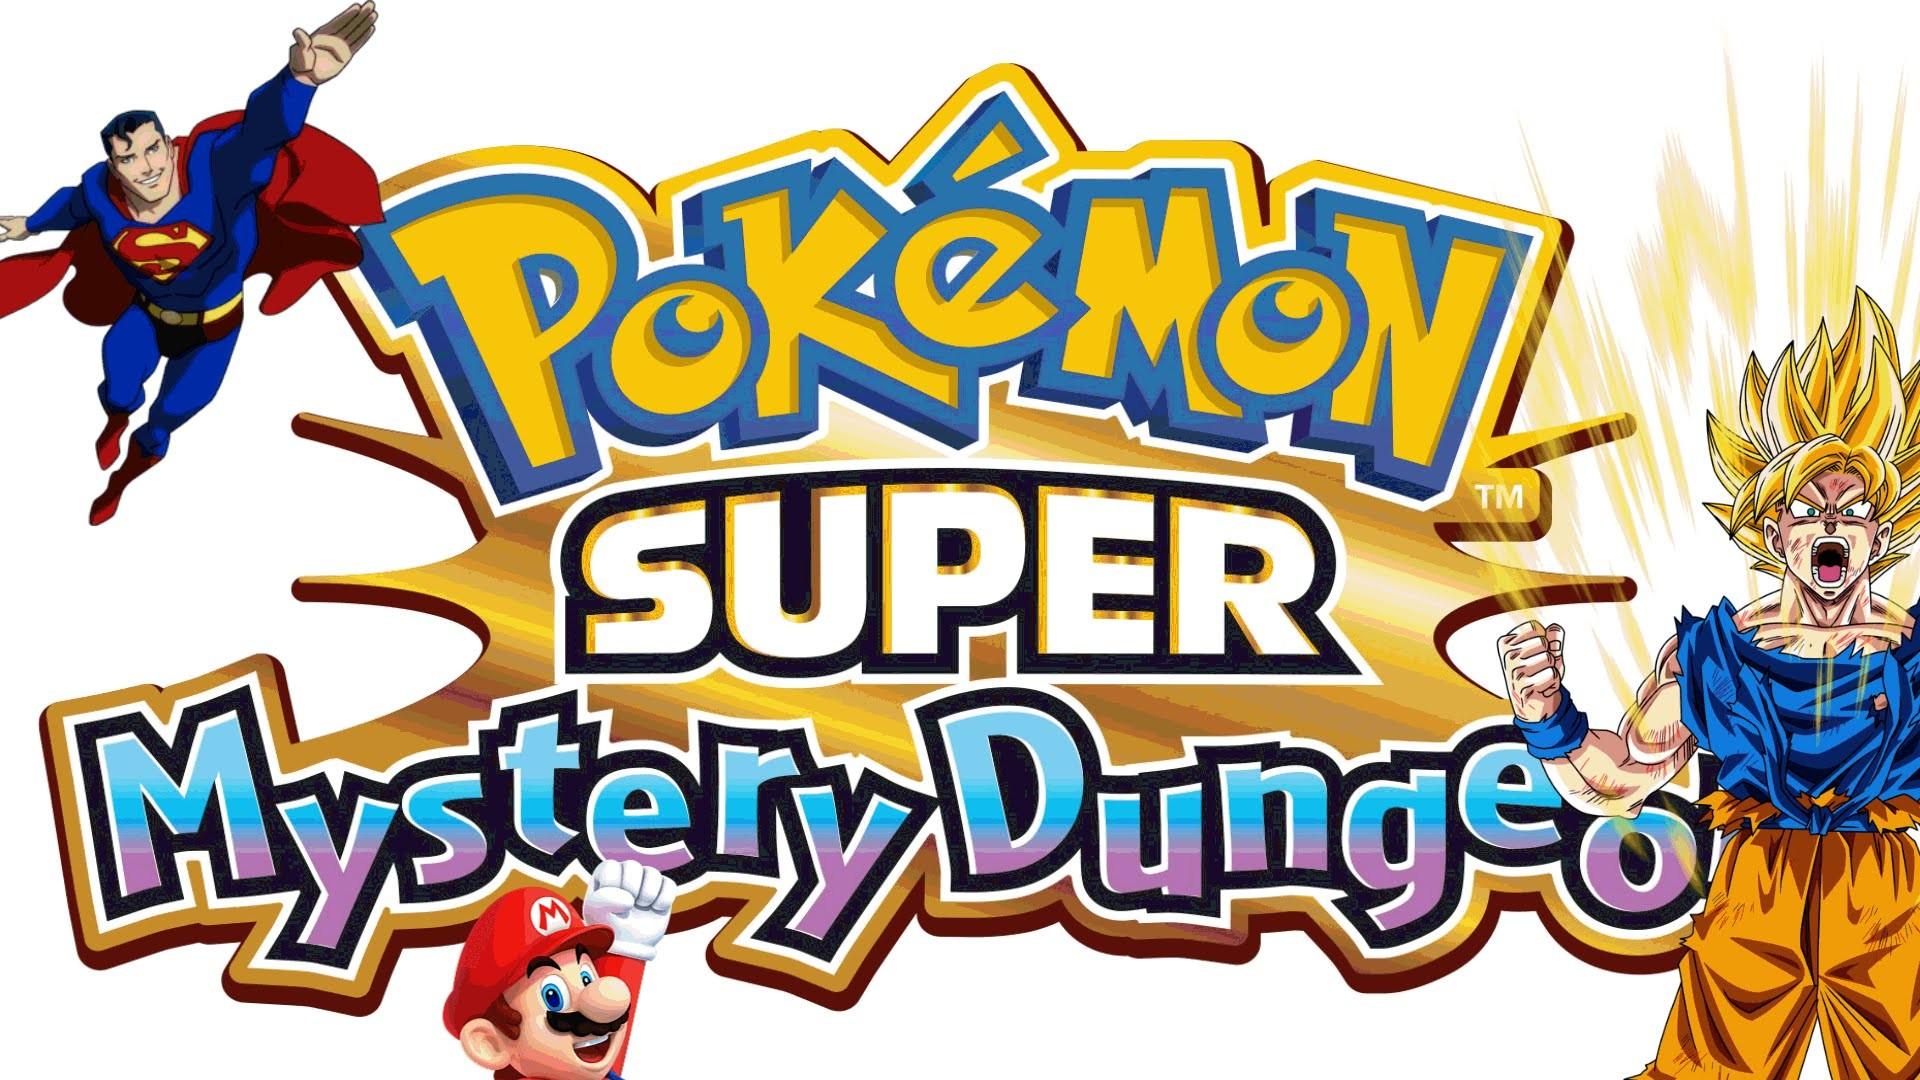 Pokémon SUPER Mystery Dungeon é UN SUPER GIOCO